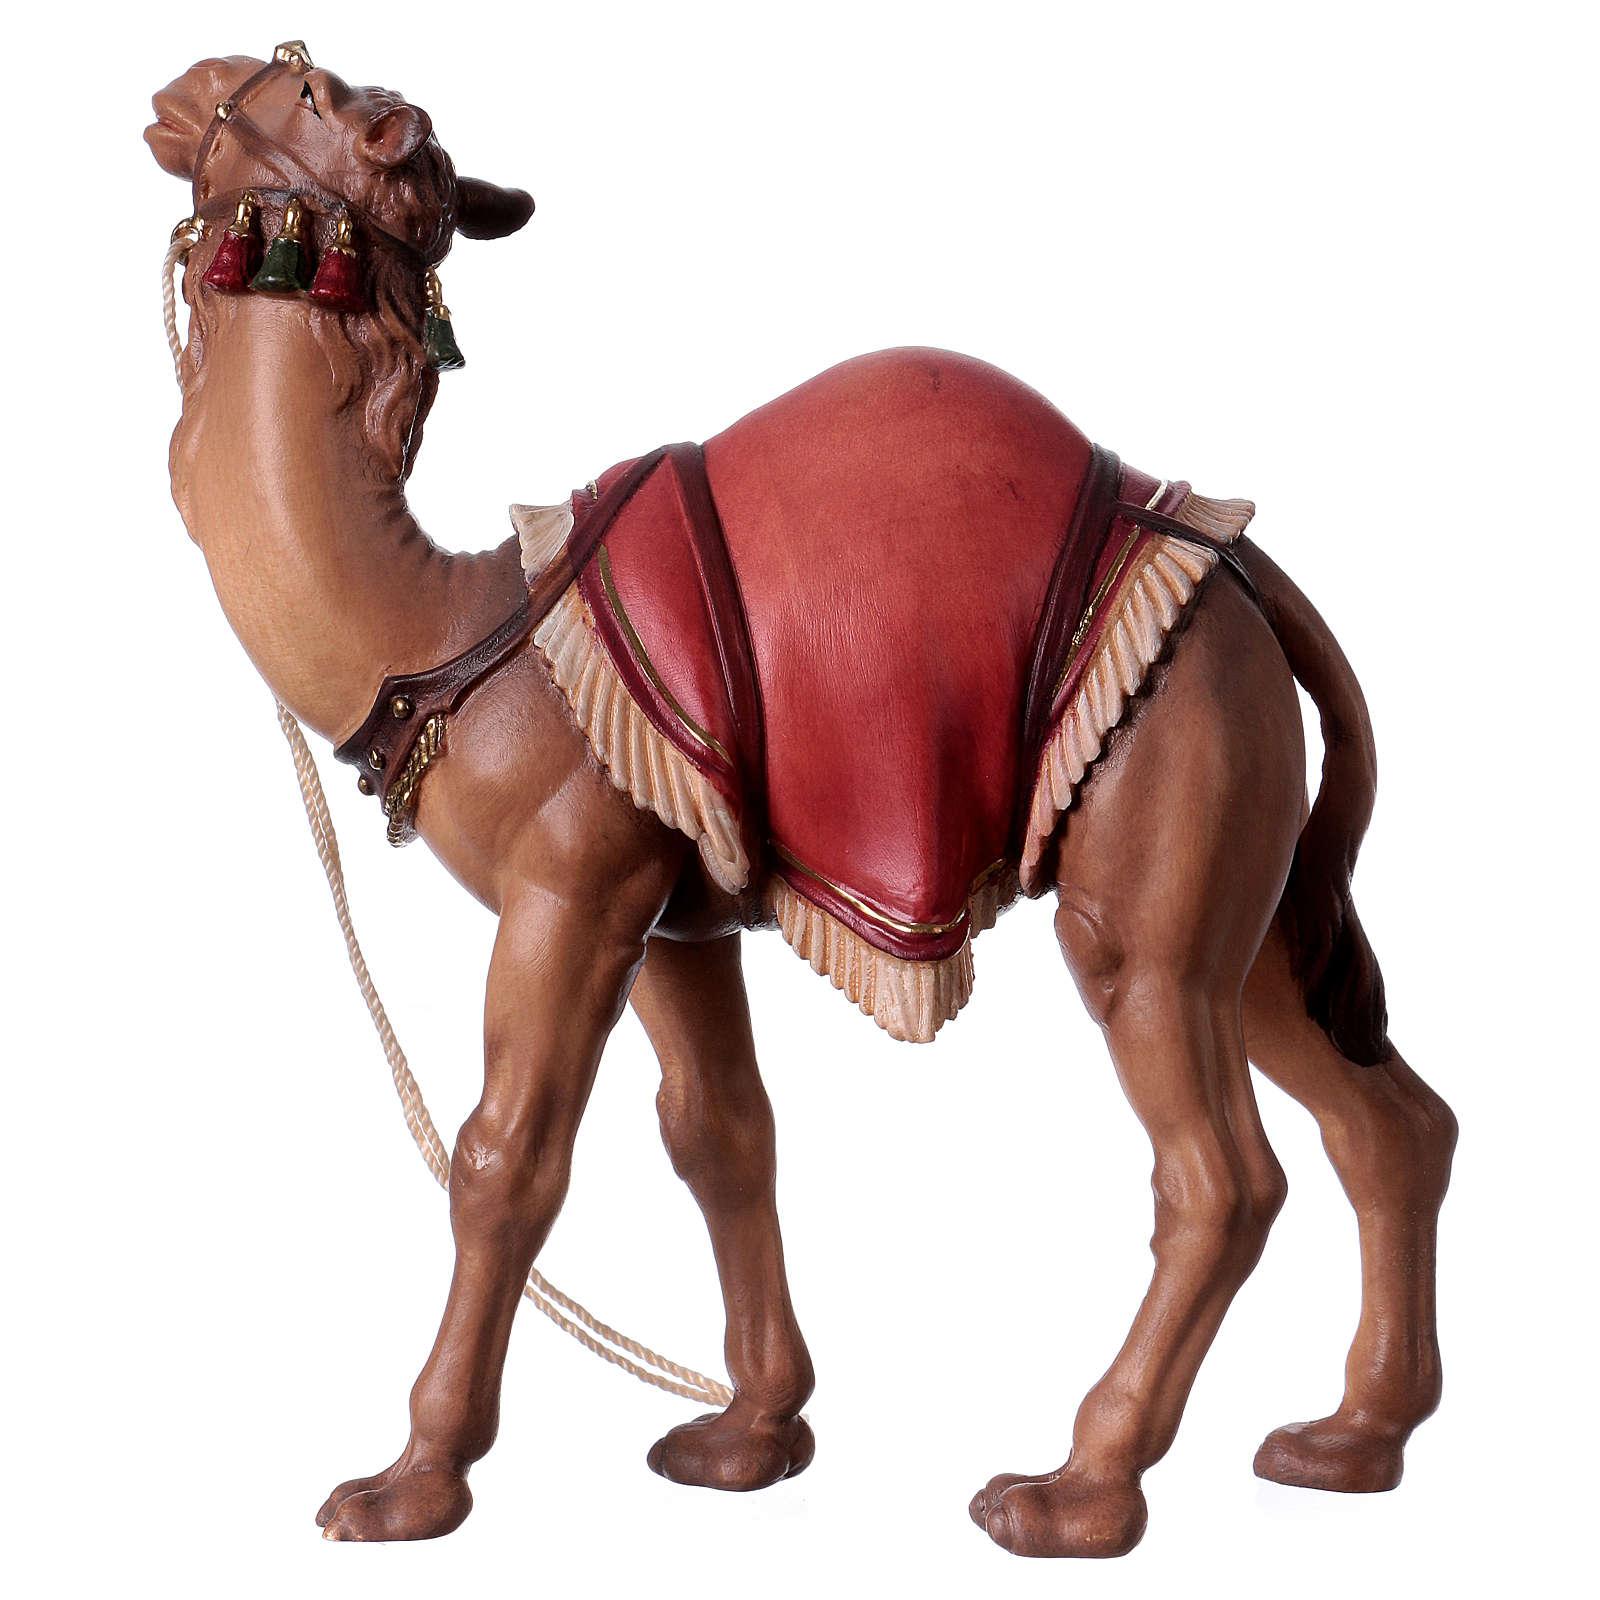 Cammello in piedi legno presepe Original legno dipinto Valgardena 12 cm 4